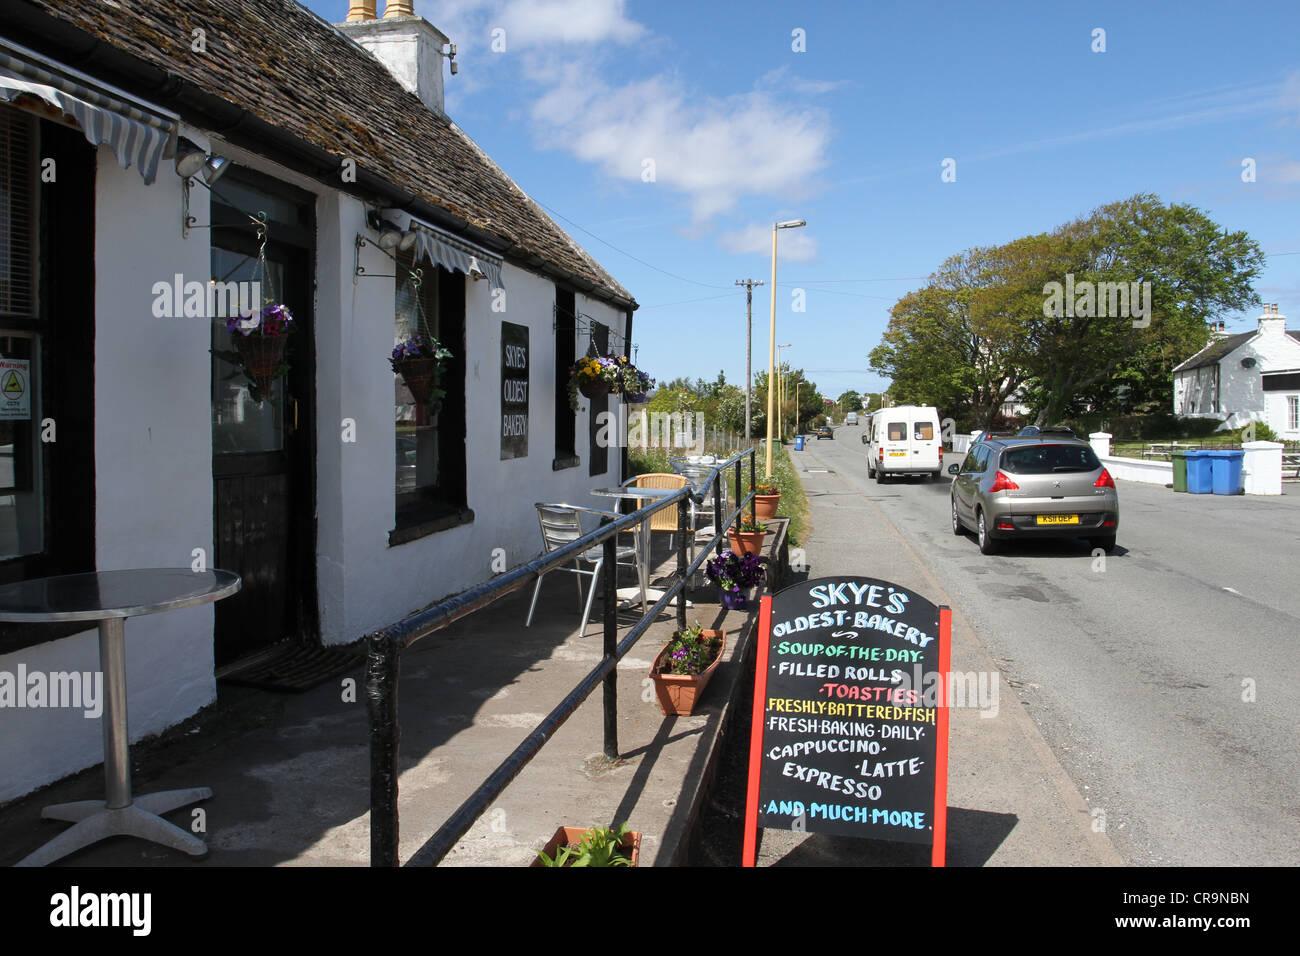 Skye's oldest bakery Dunvegan Scotland  June 2012 - Stock Image